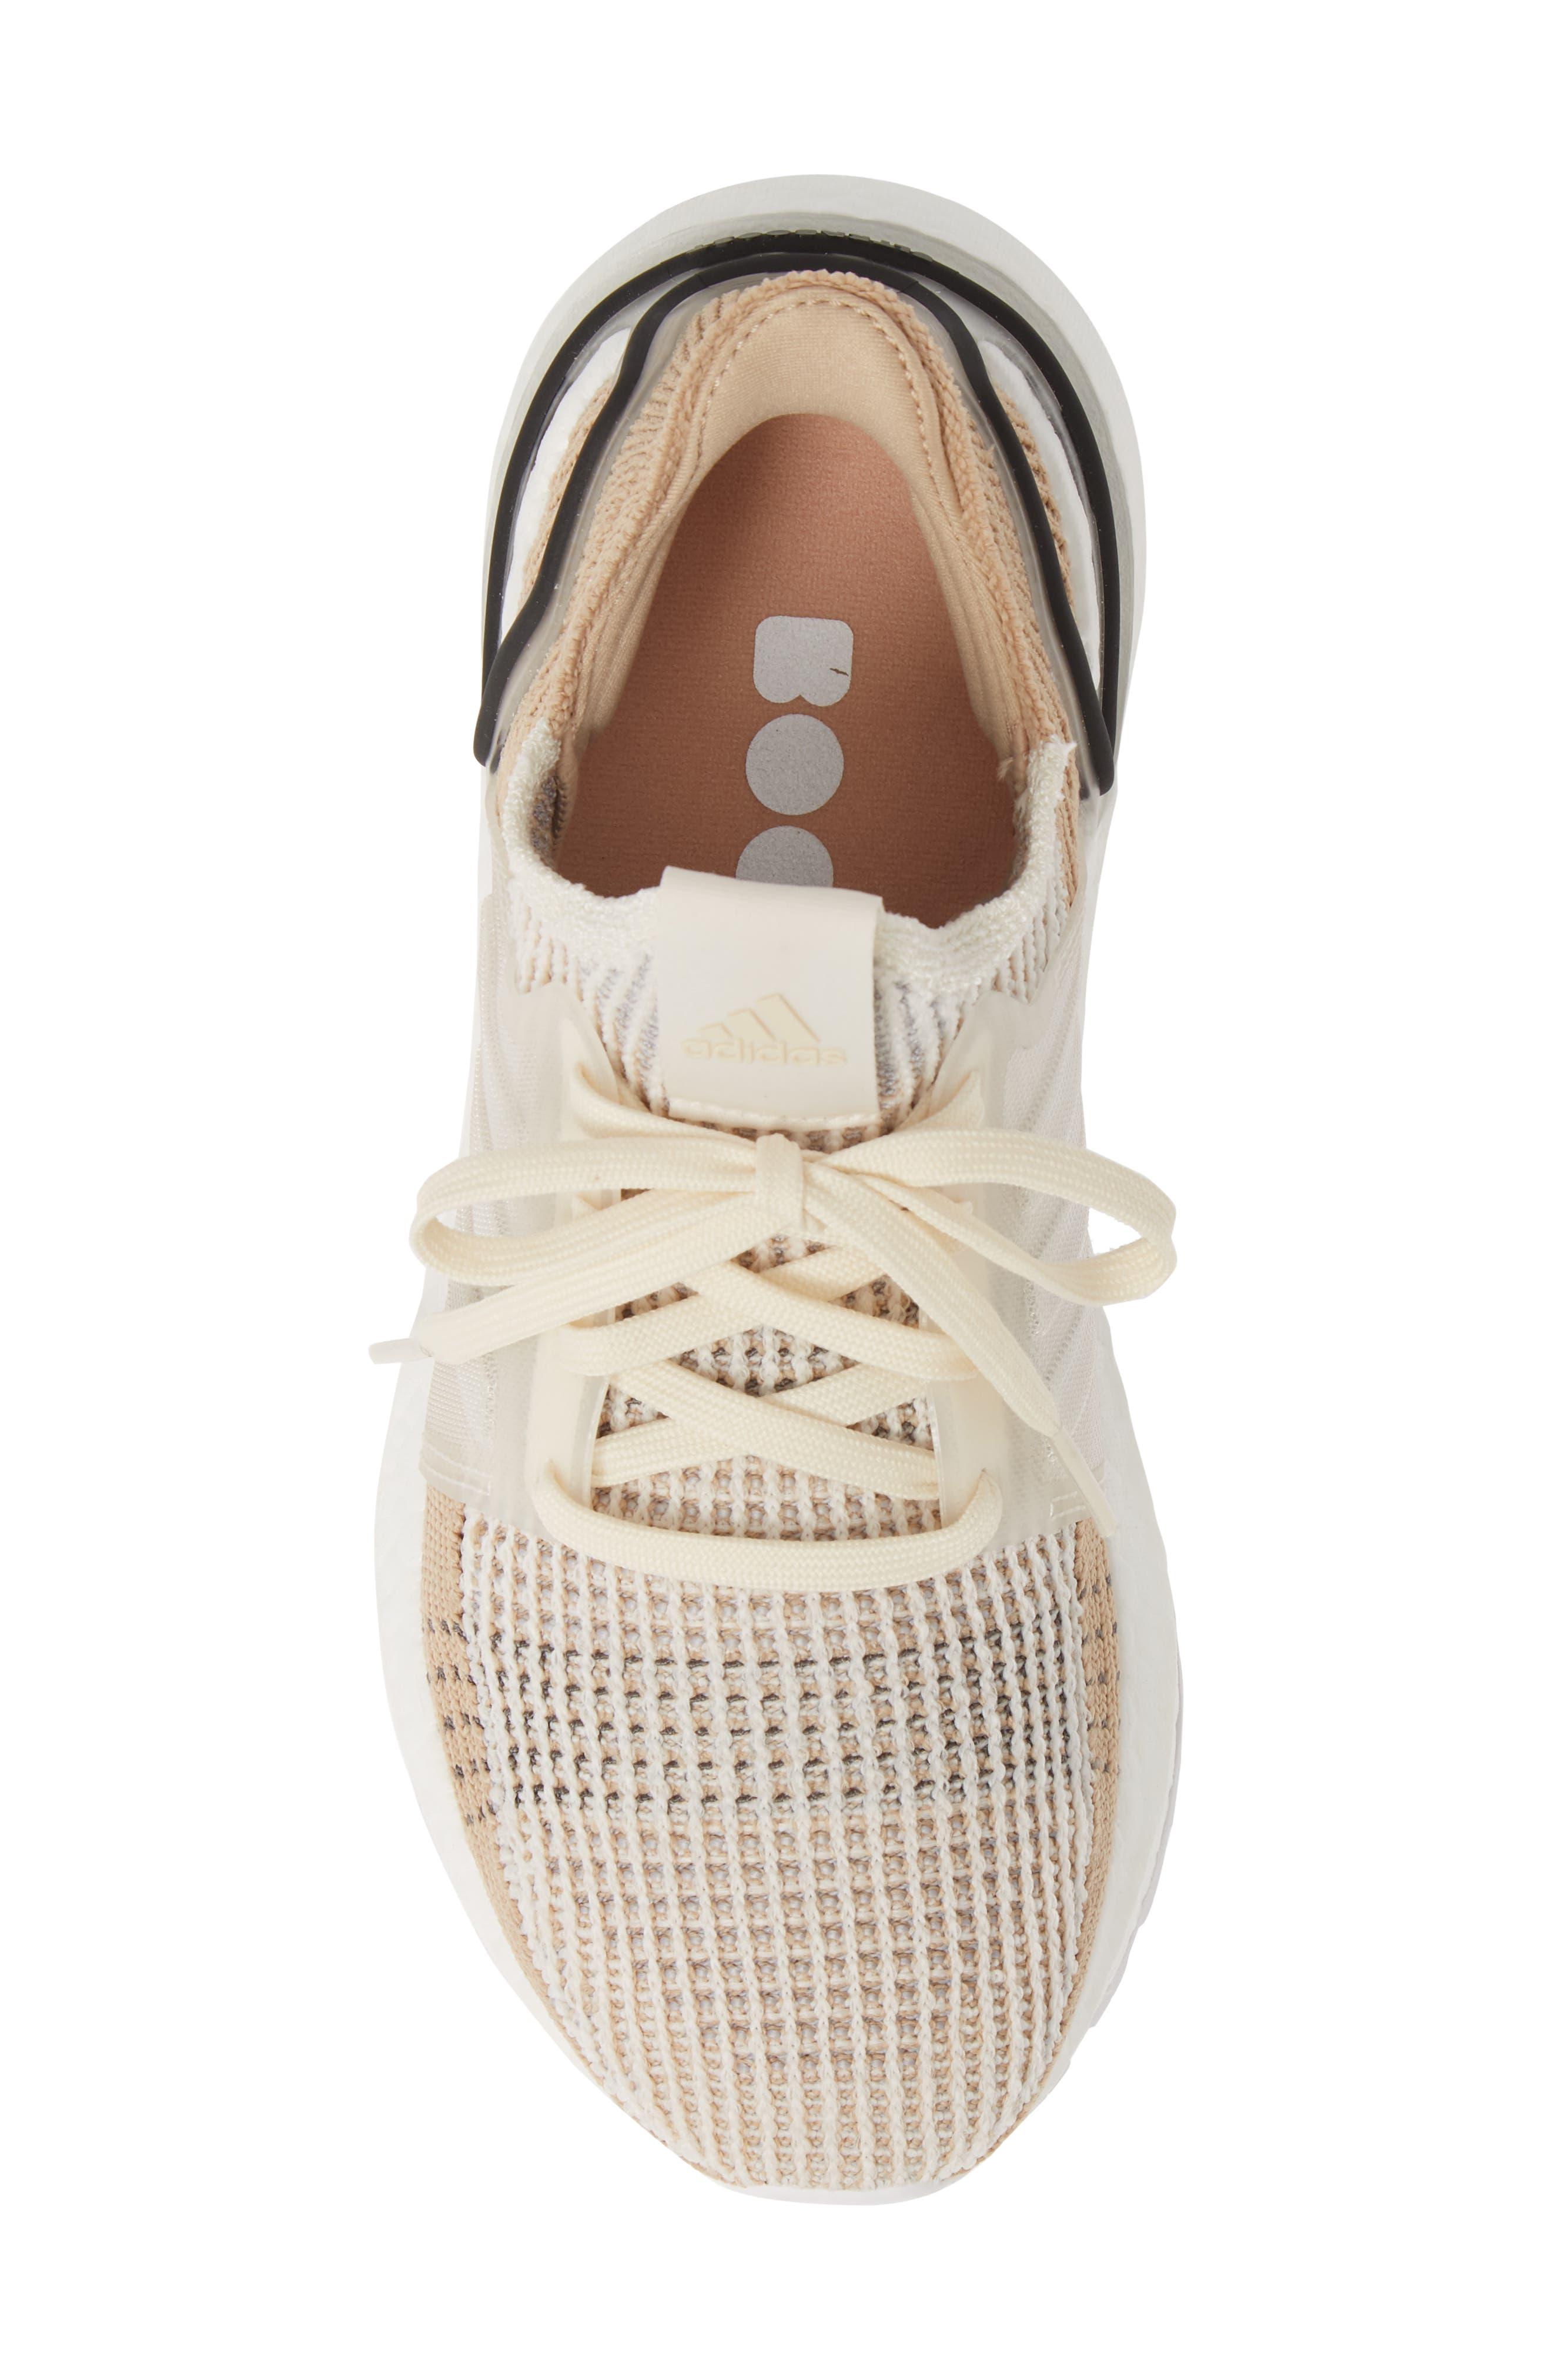 ADIDAS,                             UltraBoost 19 Running Shoe,                             Alternate thumbnail 5, color,                             CHALK WHITE/ PALE NUDE/ BLACK